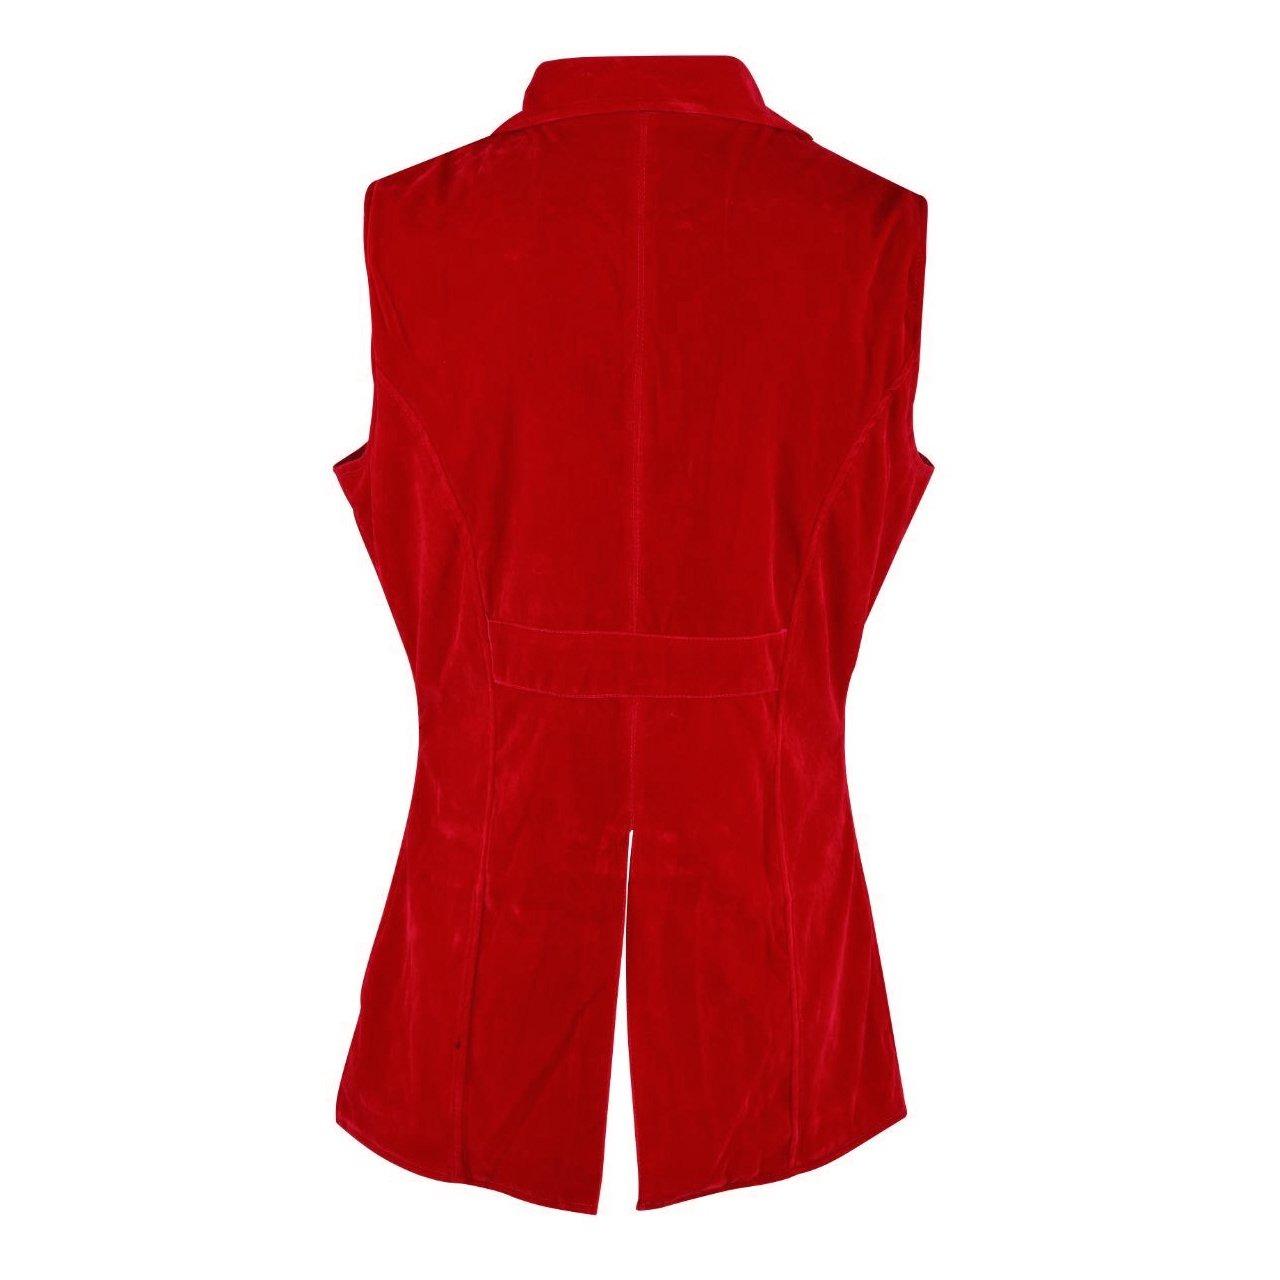 DARKROCK Men's Double Breasted GOVERNOR Vest Waistcoat VTG Red Velvet Brocade(back)